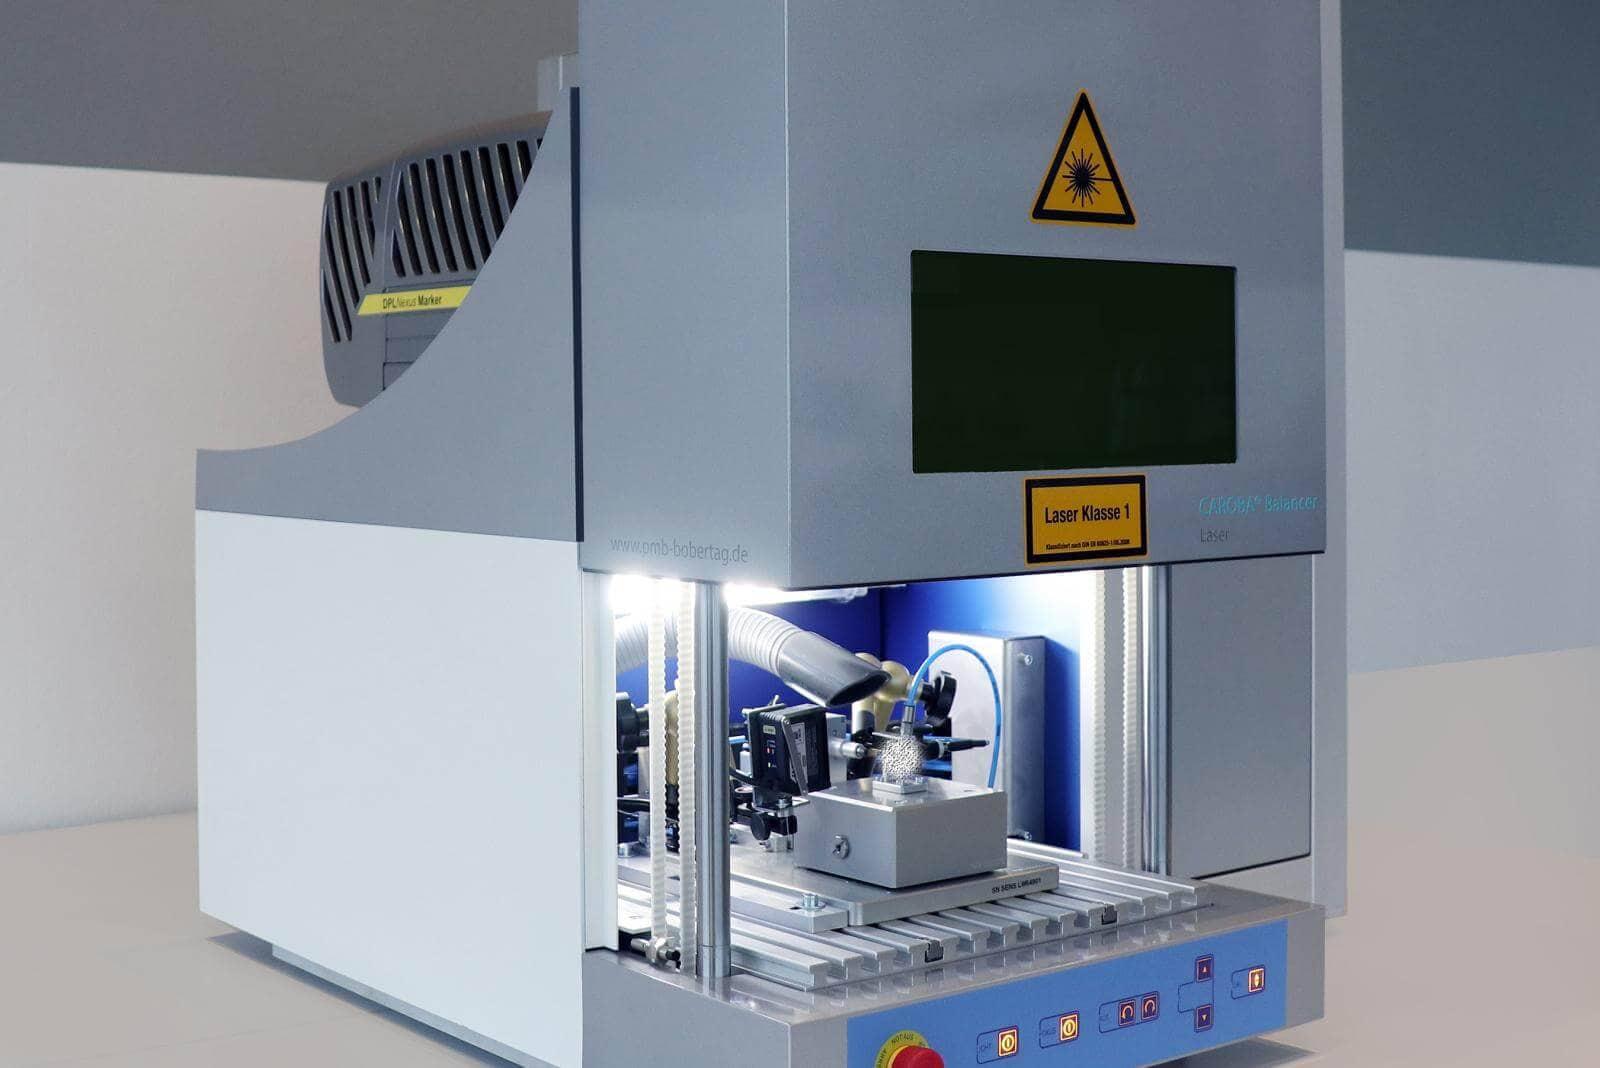 CAROBA®-Balancer-Laser-Dental-bobertag